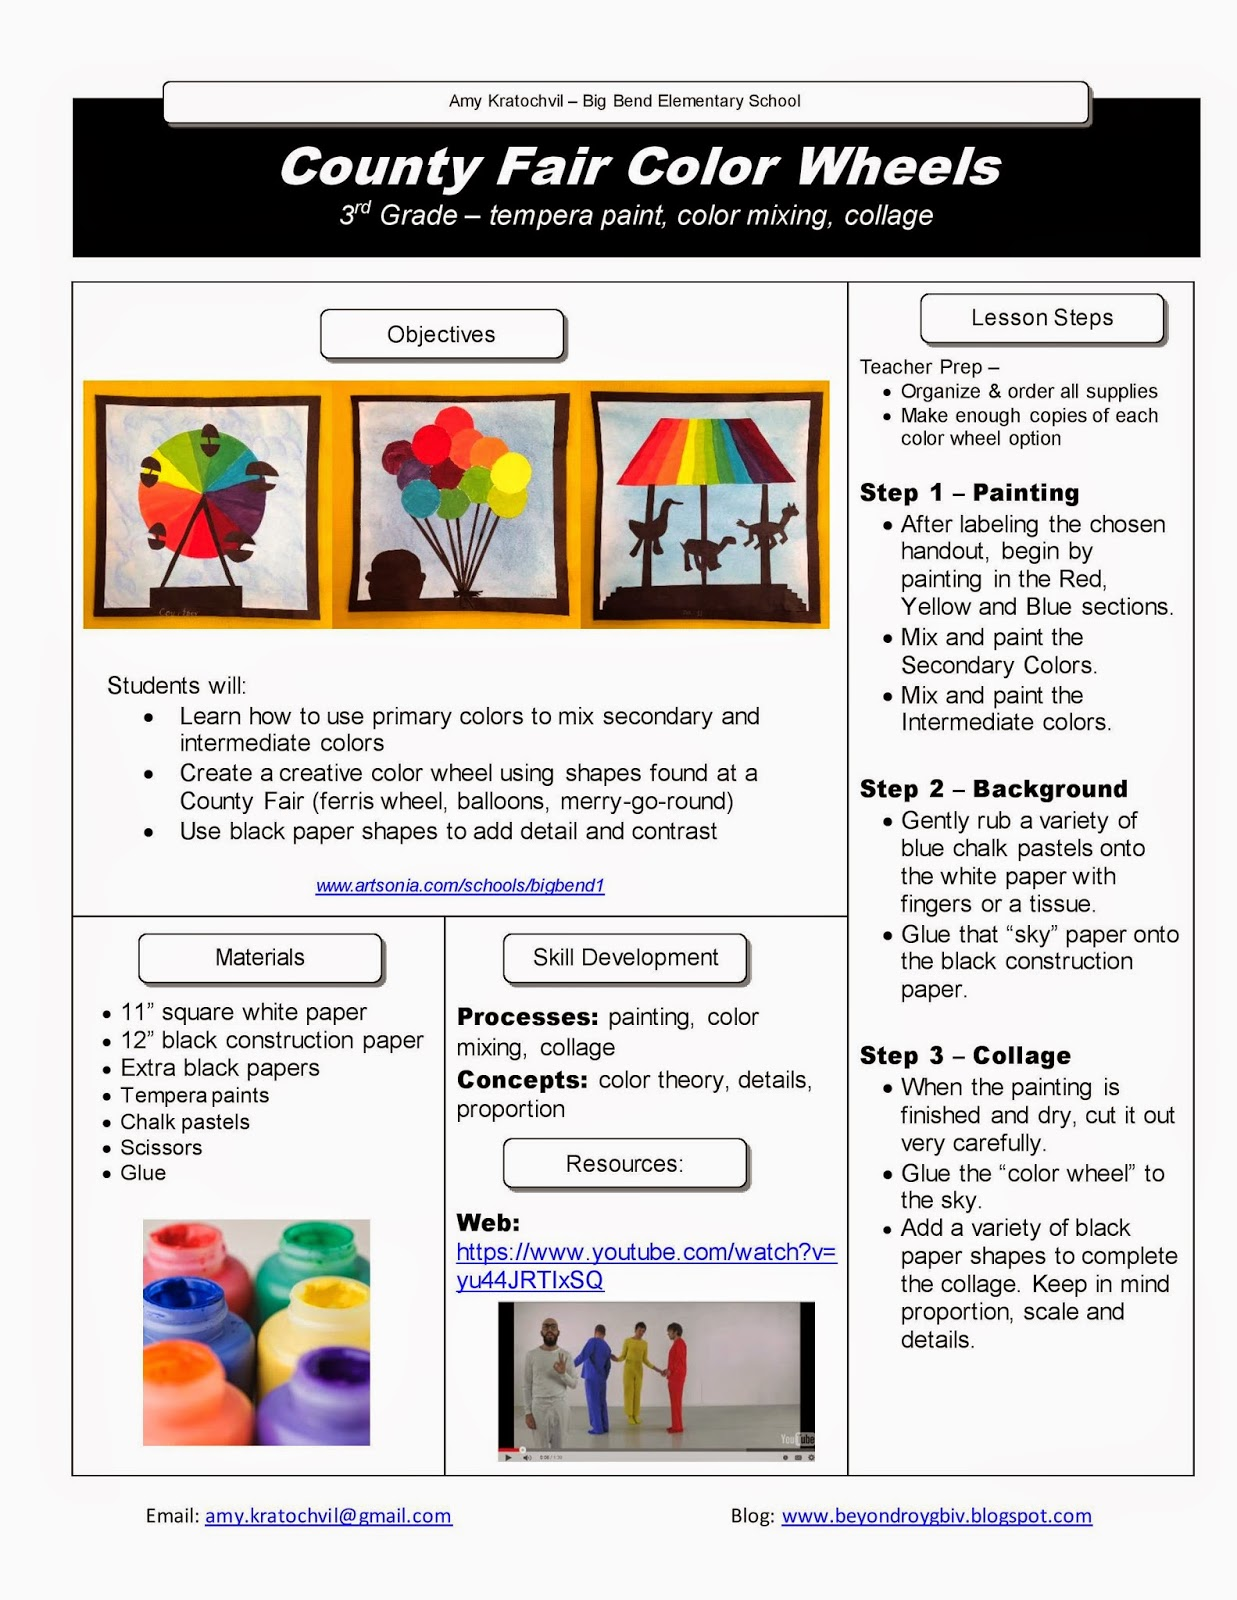 Beyond Roy G Biv Free Lesson Plan 3 County Fair Color